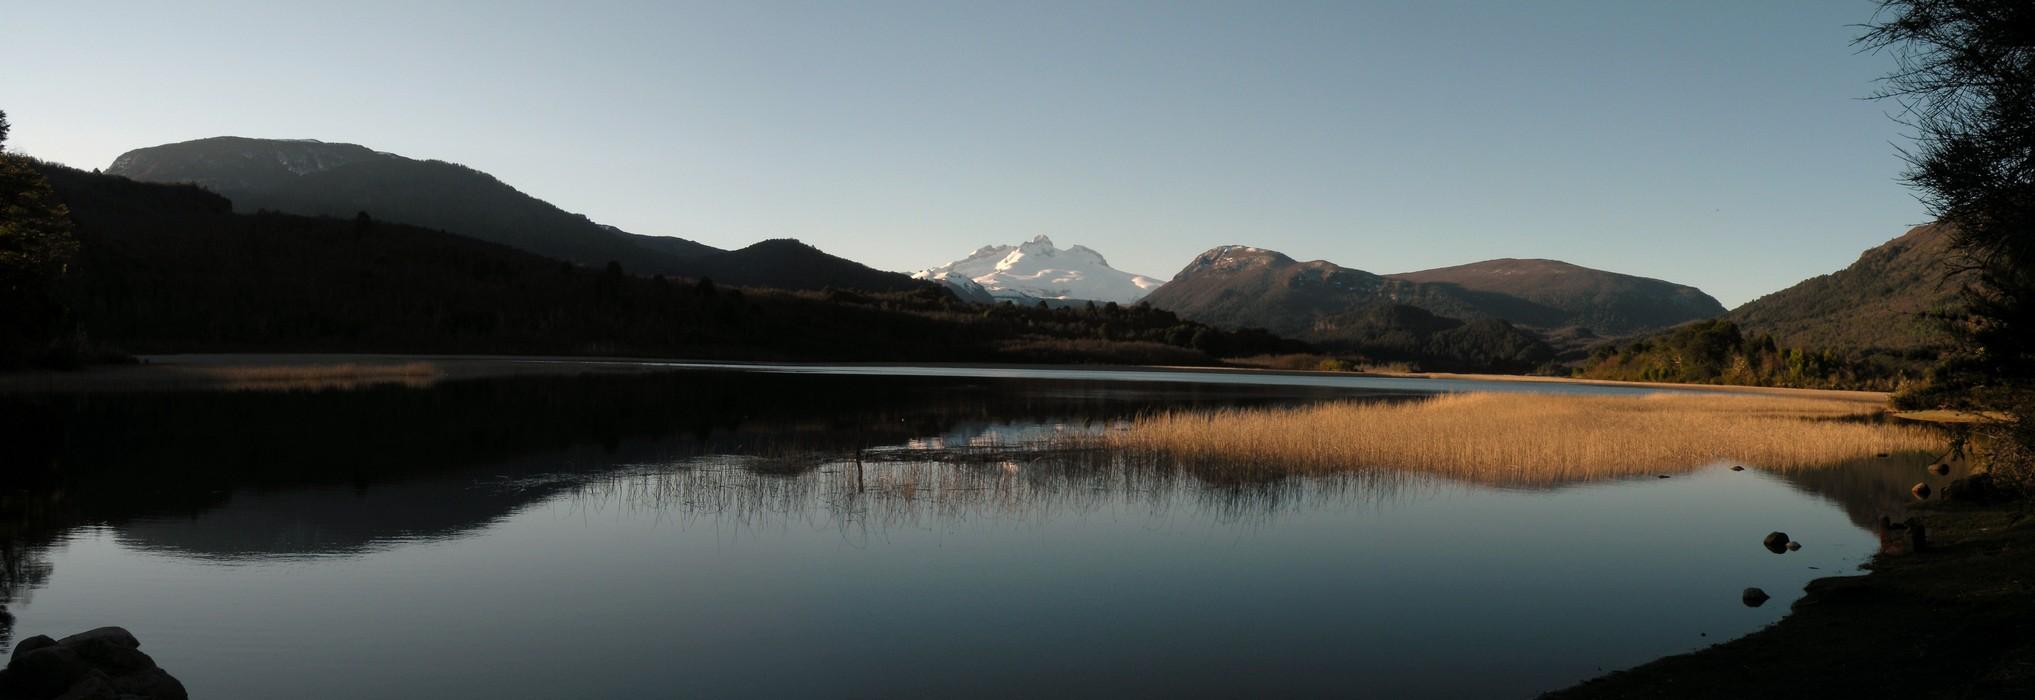 Cerro Tronador - Parc Nahuel Huapi - Bariloche